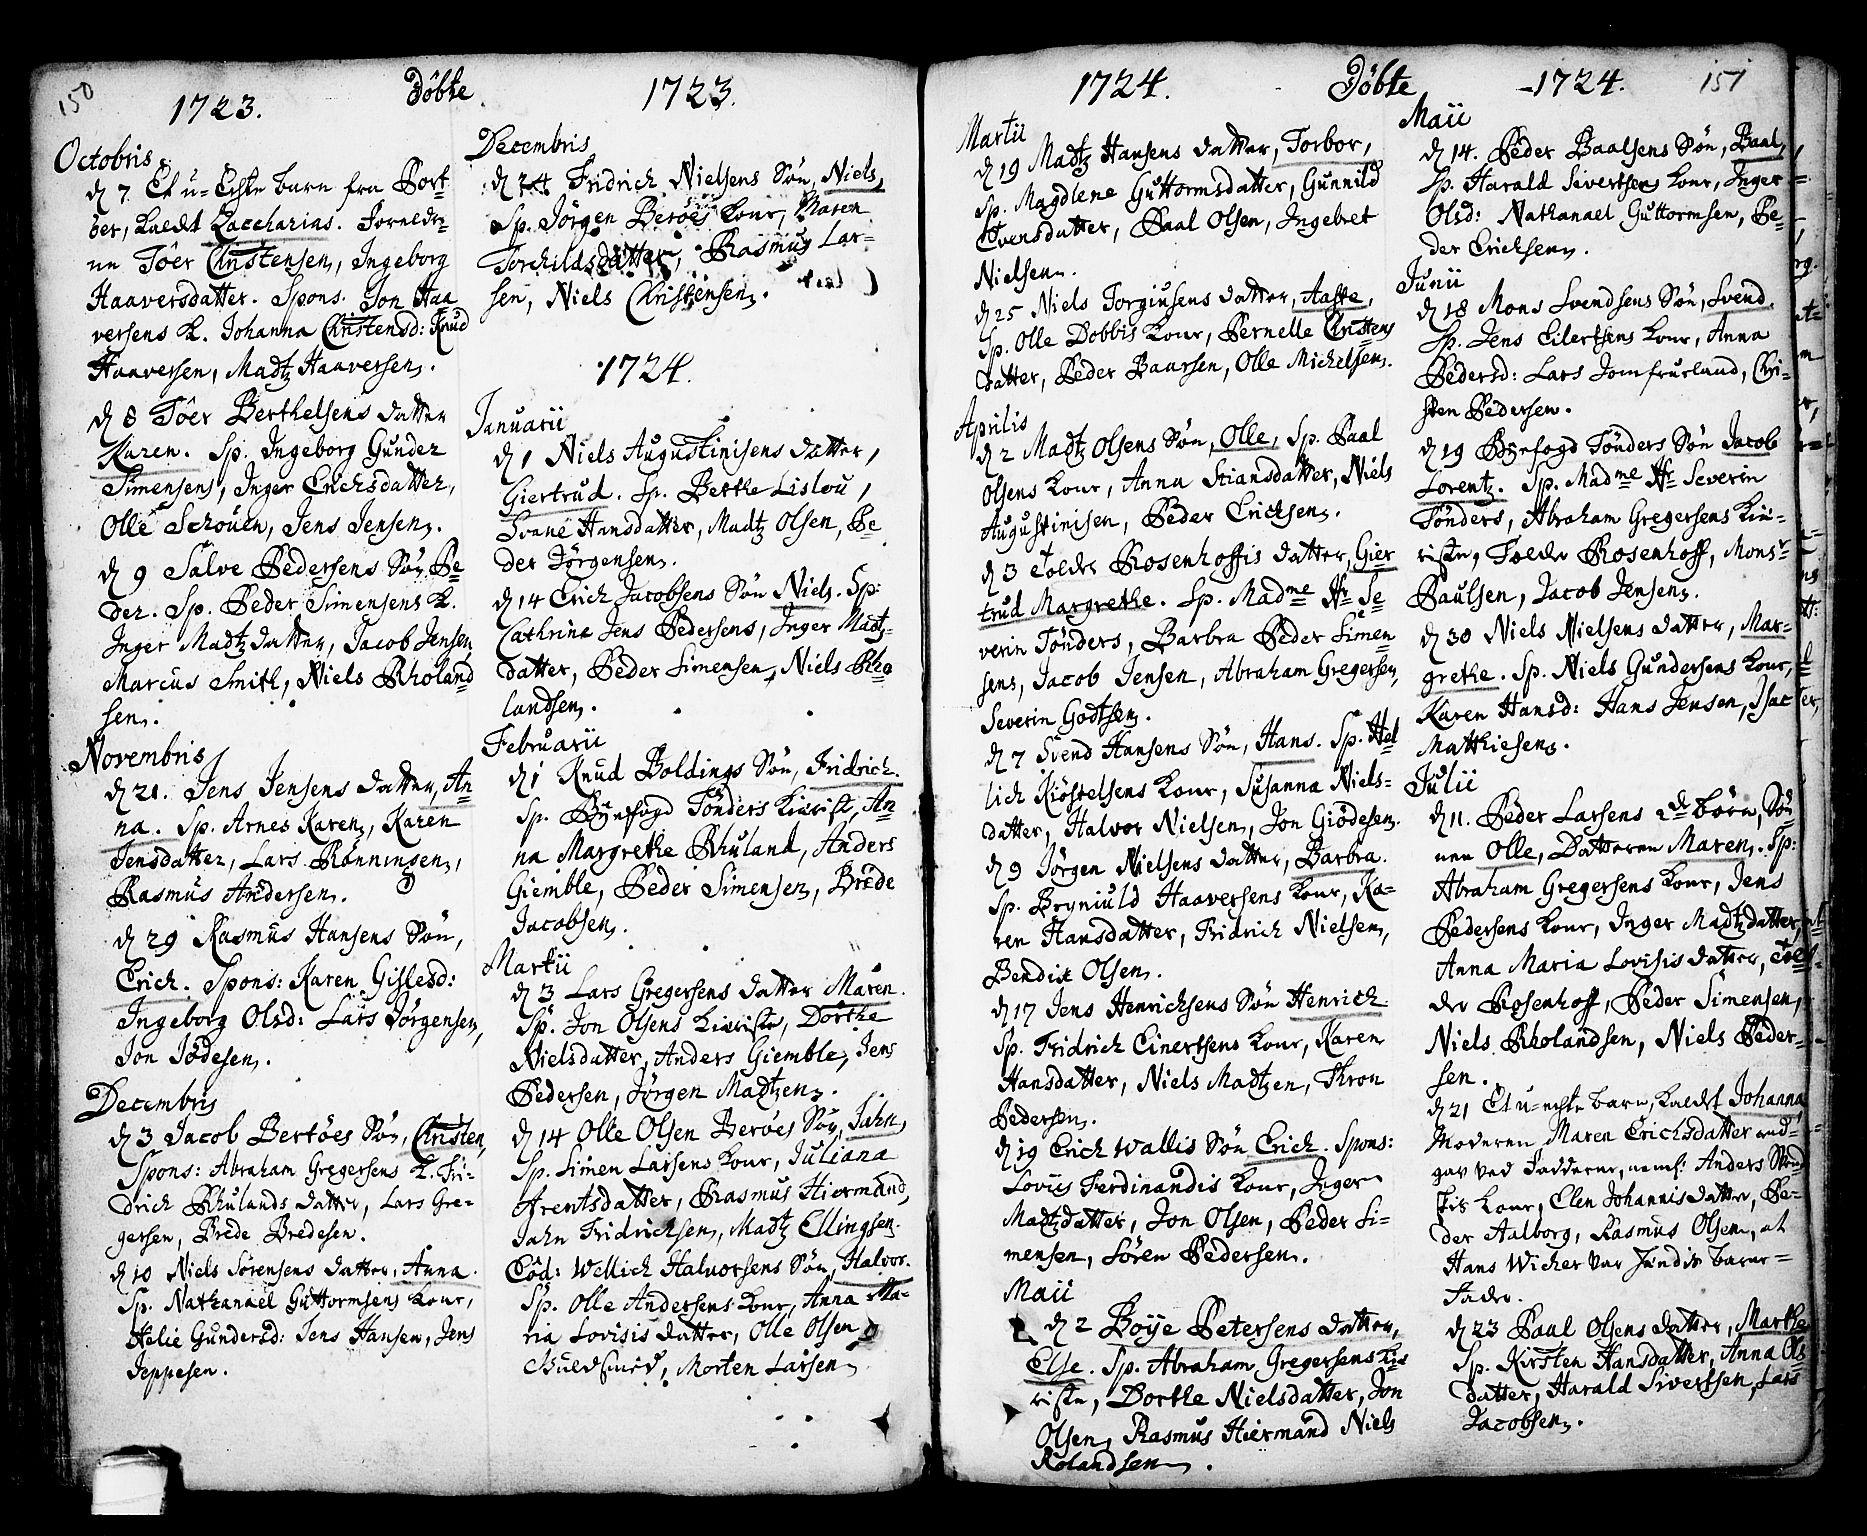 SAKO, Kragerø kirkebøker, F/Fa/L0001: Ministerialbok nr. 1, 1702-1766, s. 150-151